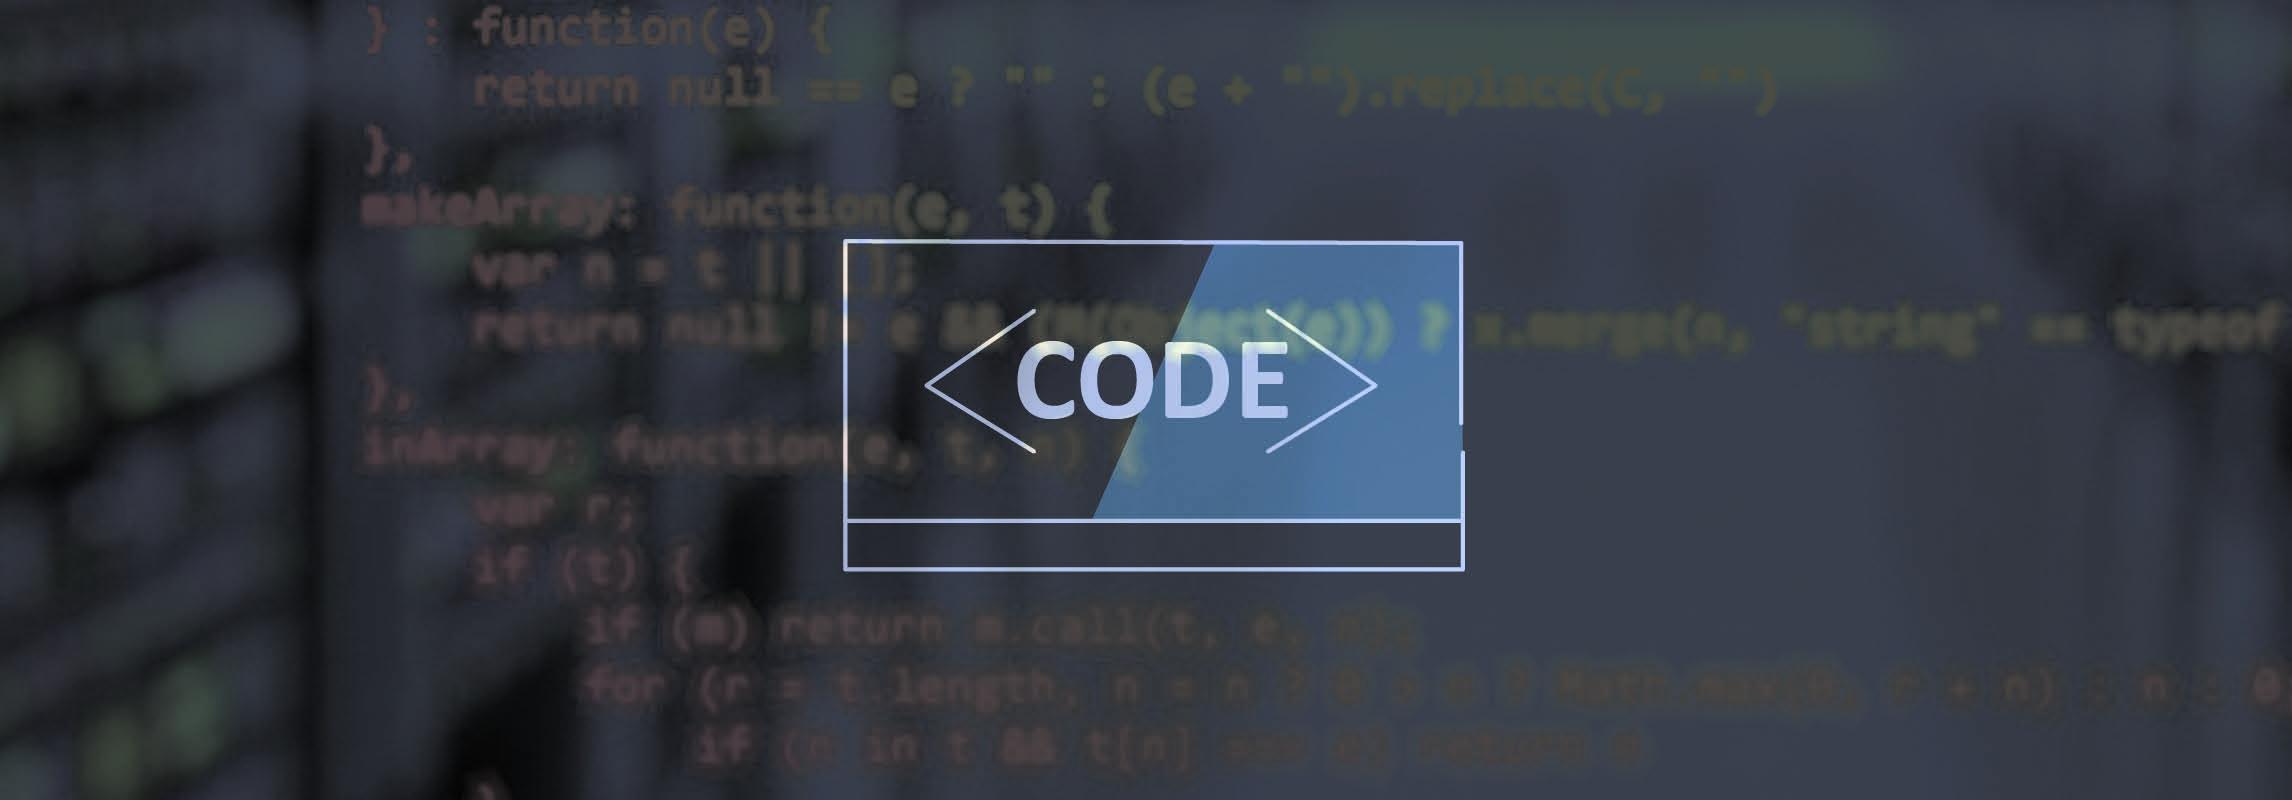 Programming language icon - task window with code